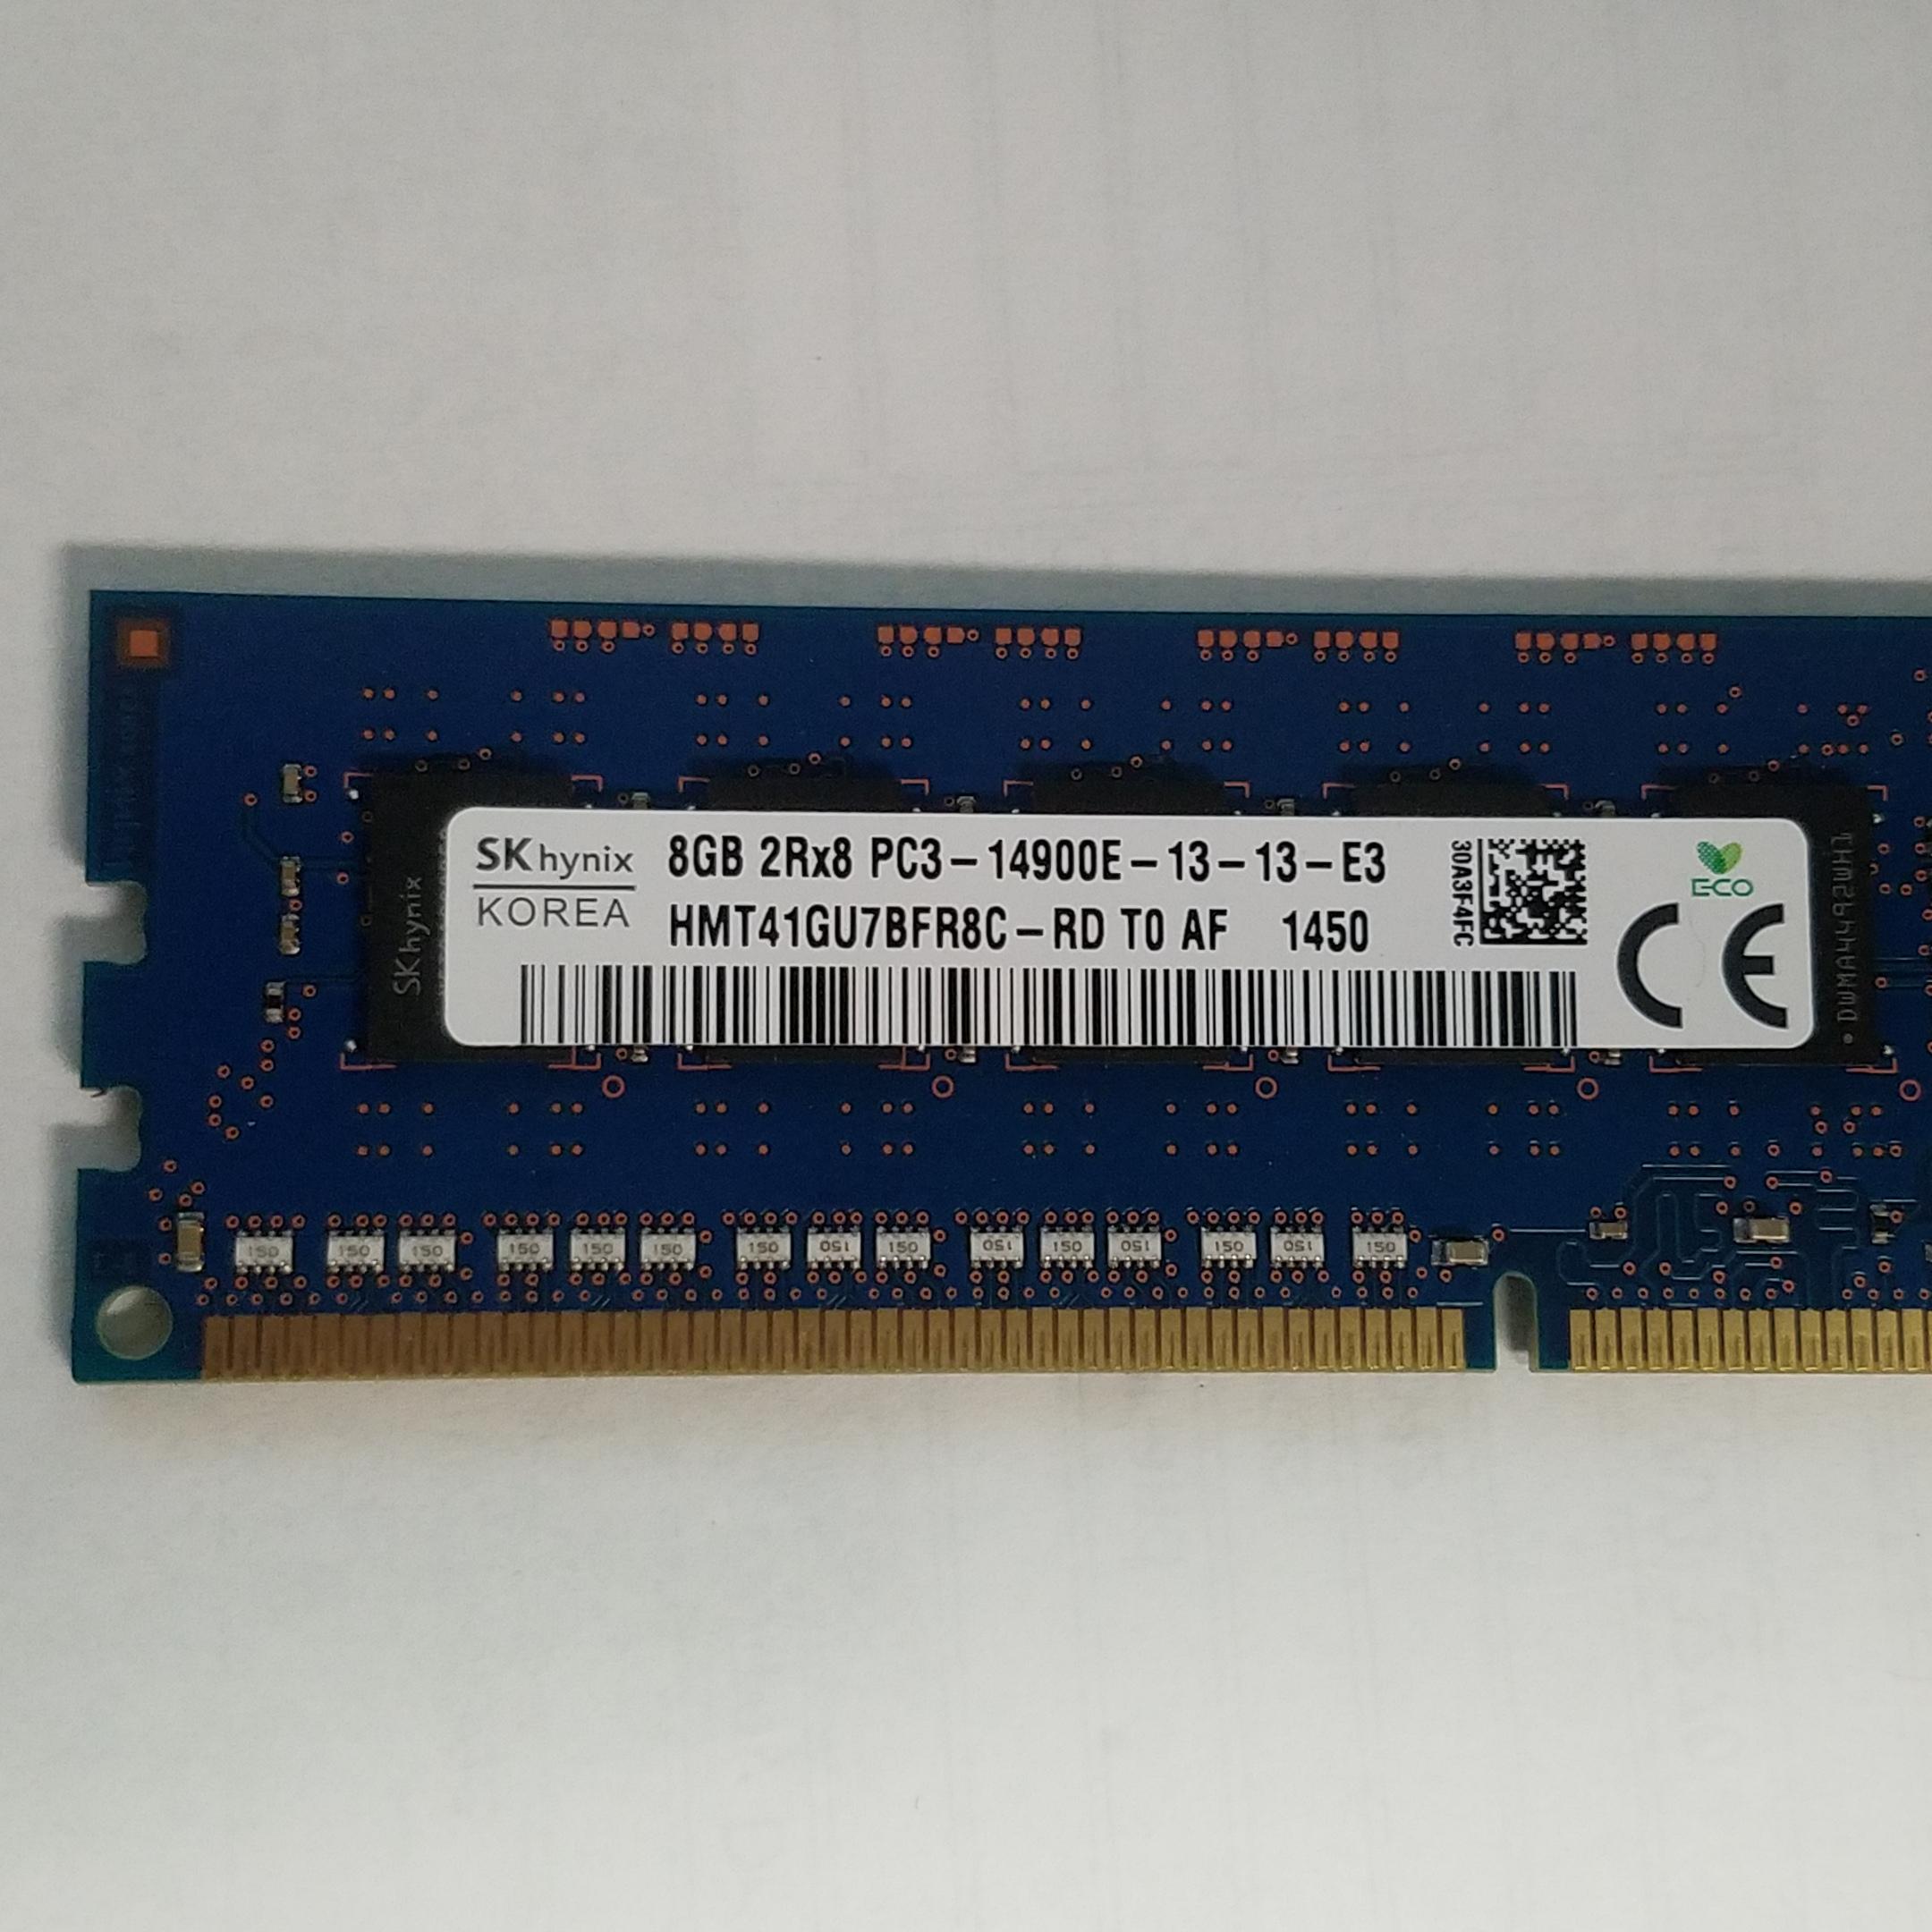 8GB Hynix HP 712288-581 PC3-14900E DDR3 2Rx8 Unbuffered ECC Server Memory RAM